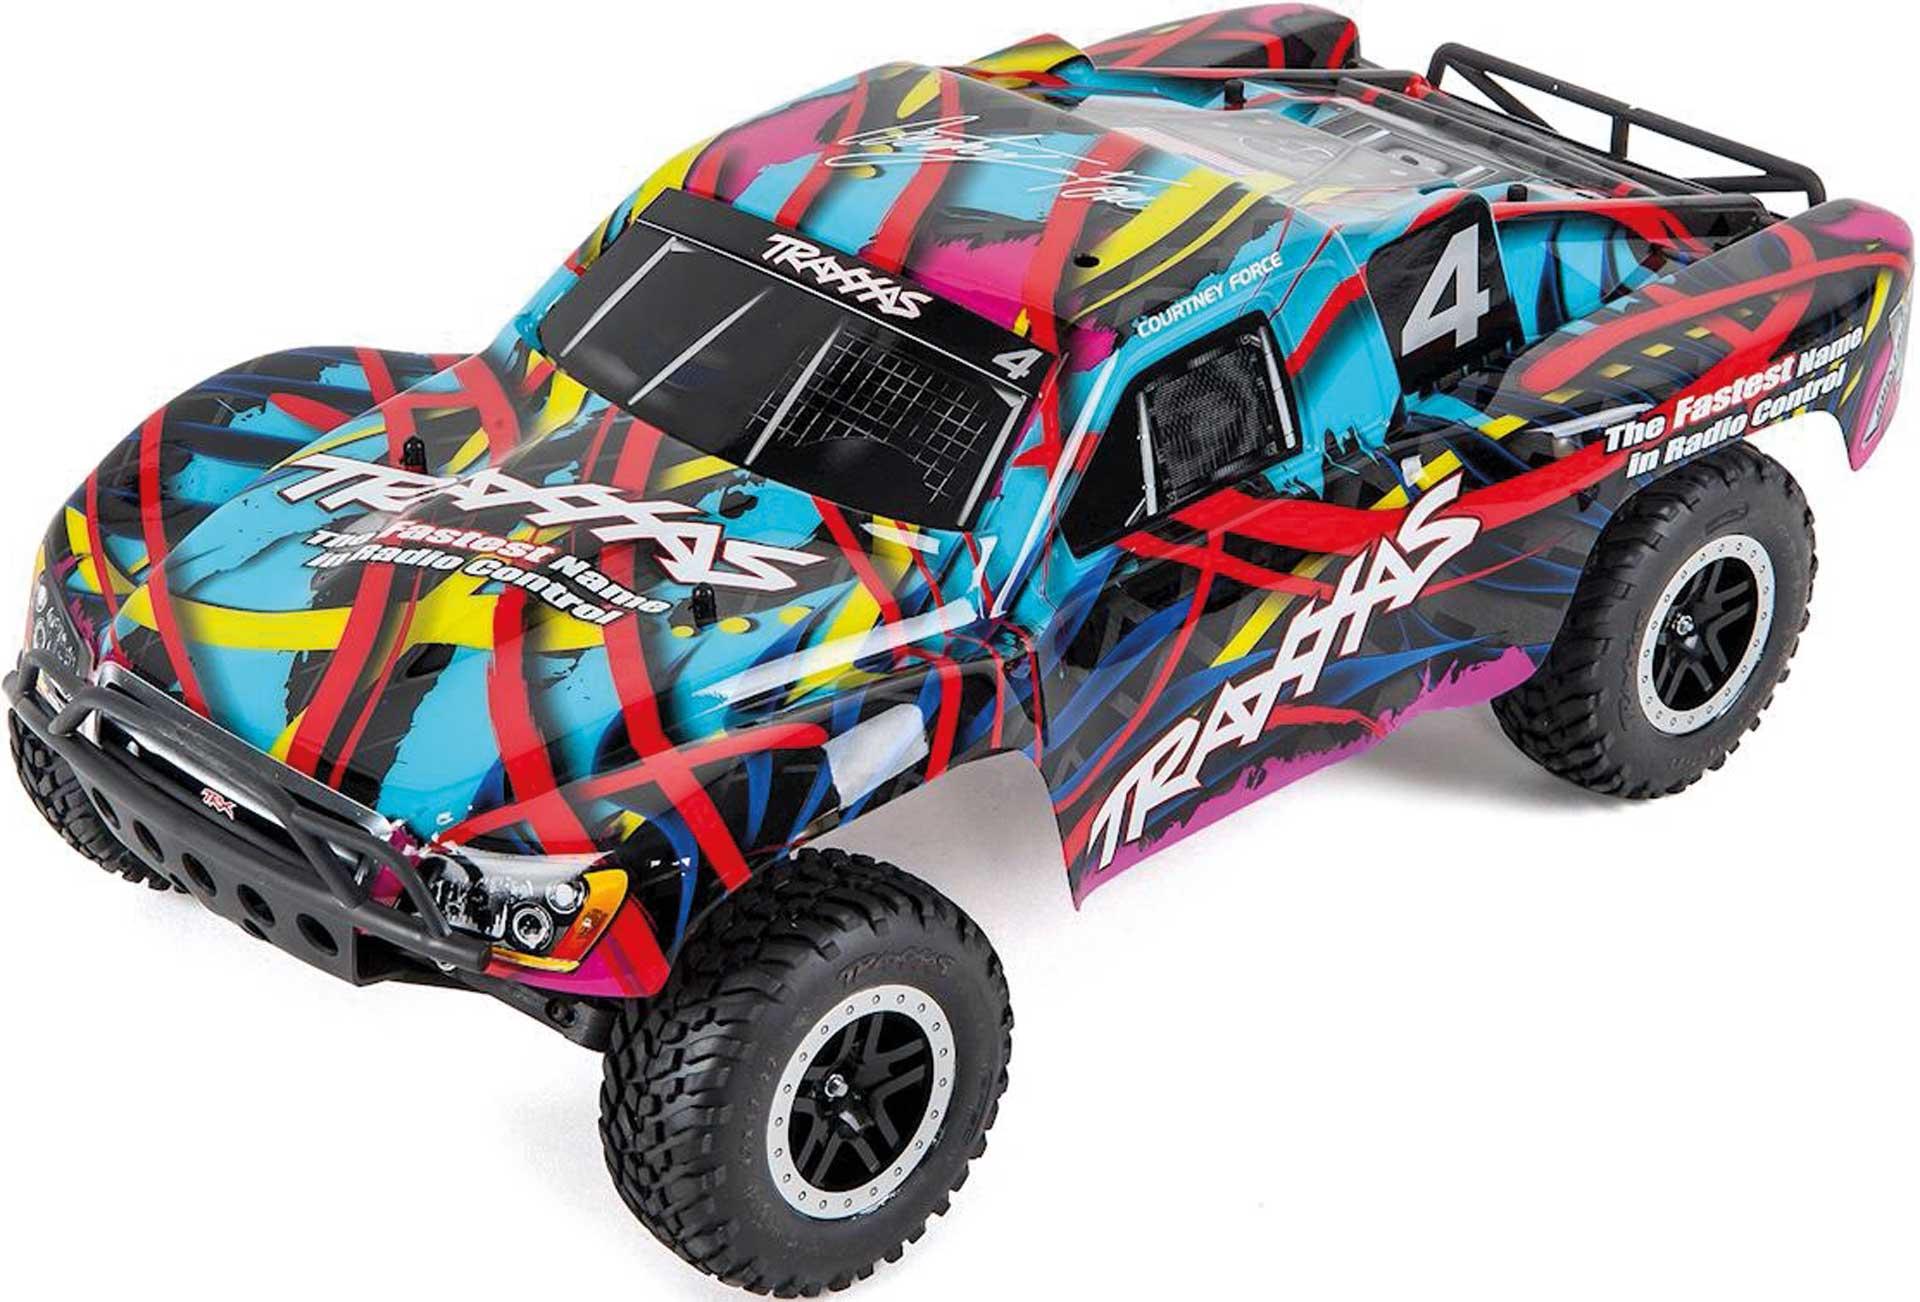 Traxxas SLASH VXL HAWAIIAN RTR OHNE AKKU/LADER 1/10 2WD SHORT COURSE RACING TRUCK BRUSHLESS